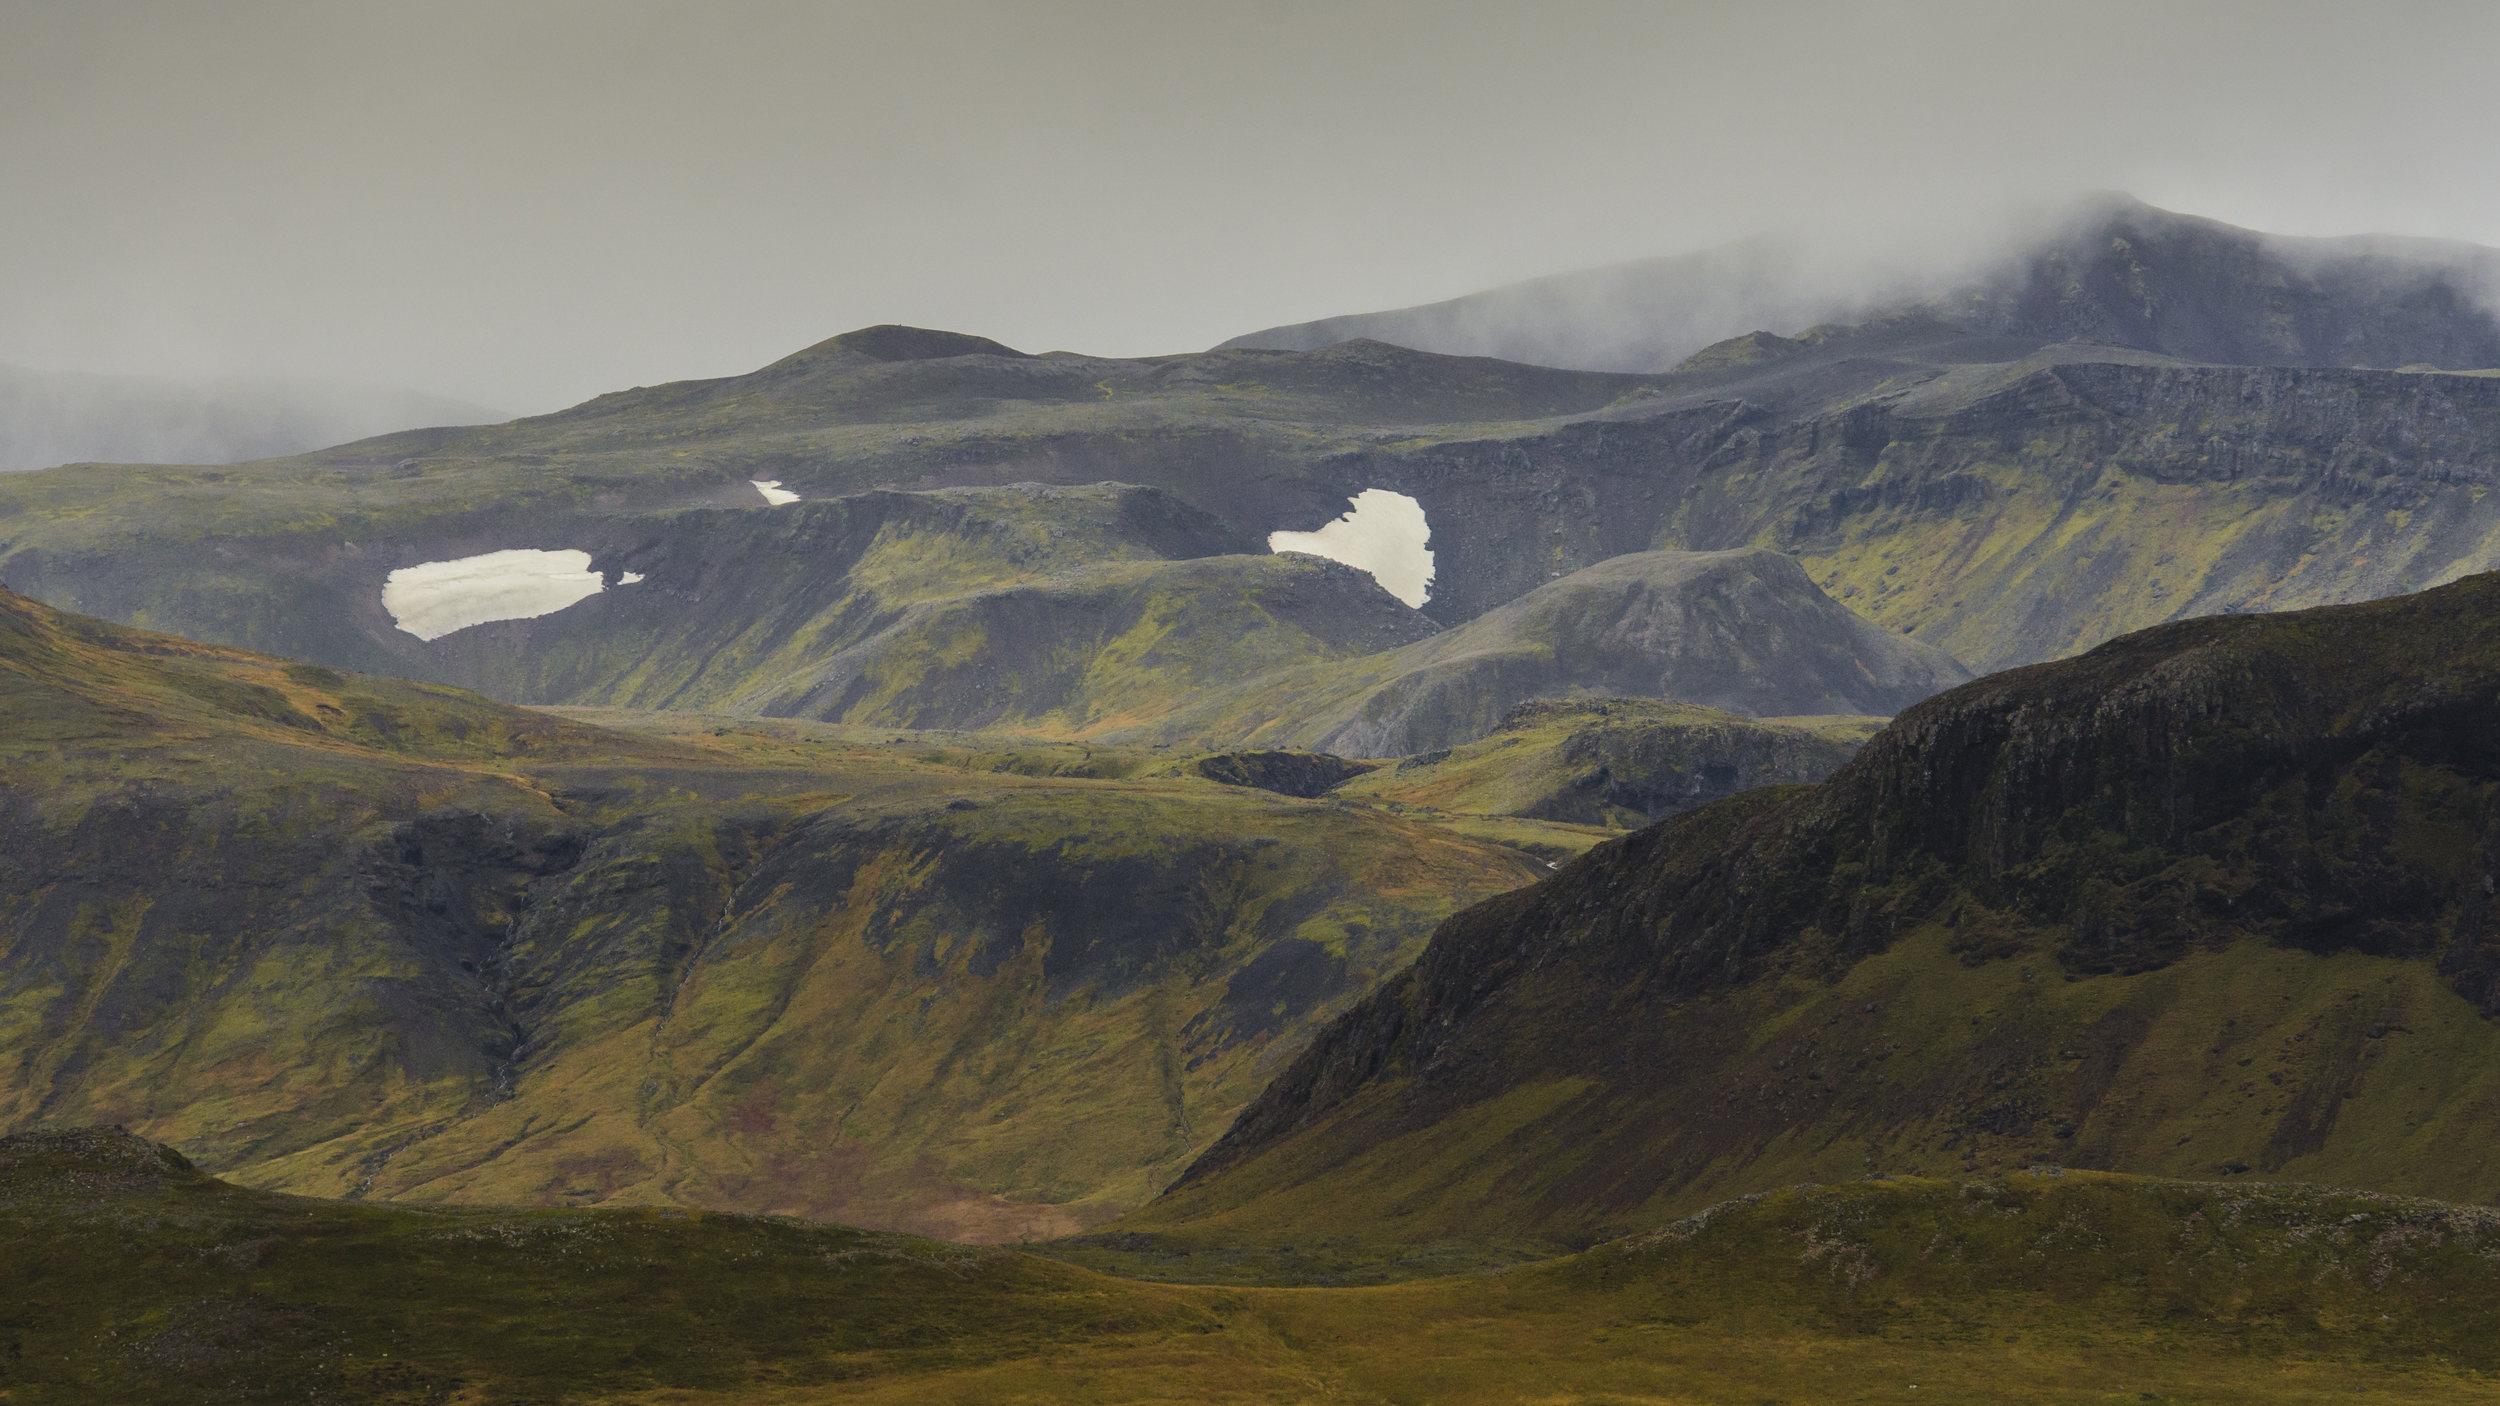 Mountains and Moss, Snaefellsness Peninsula